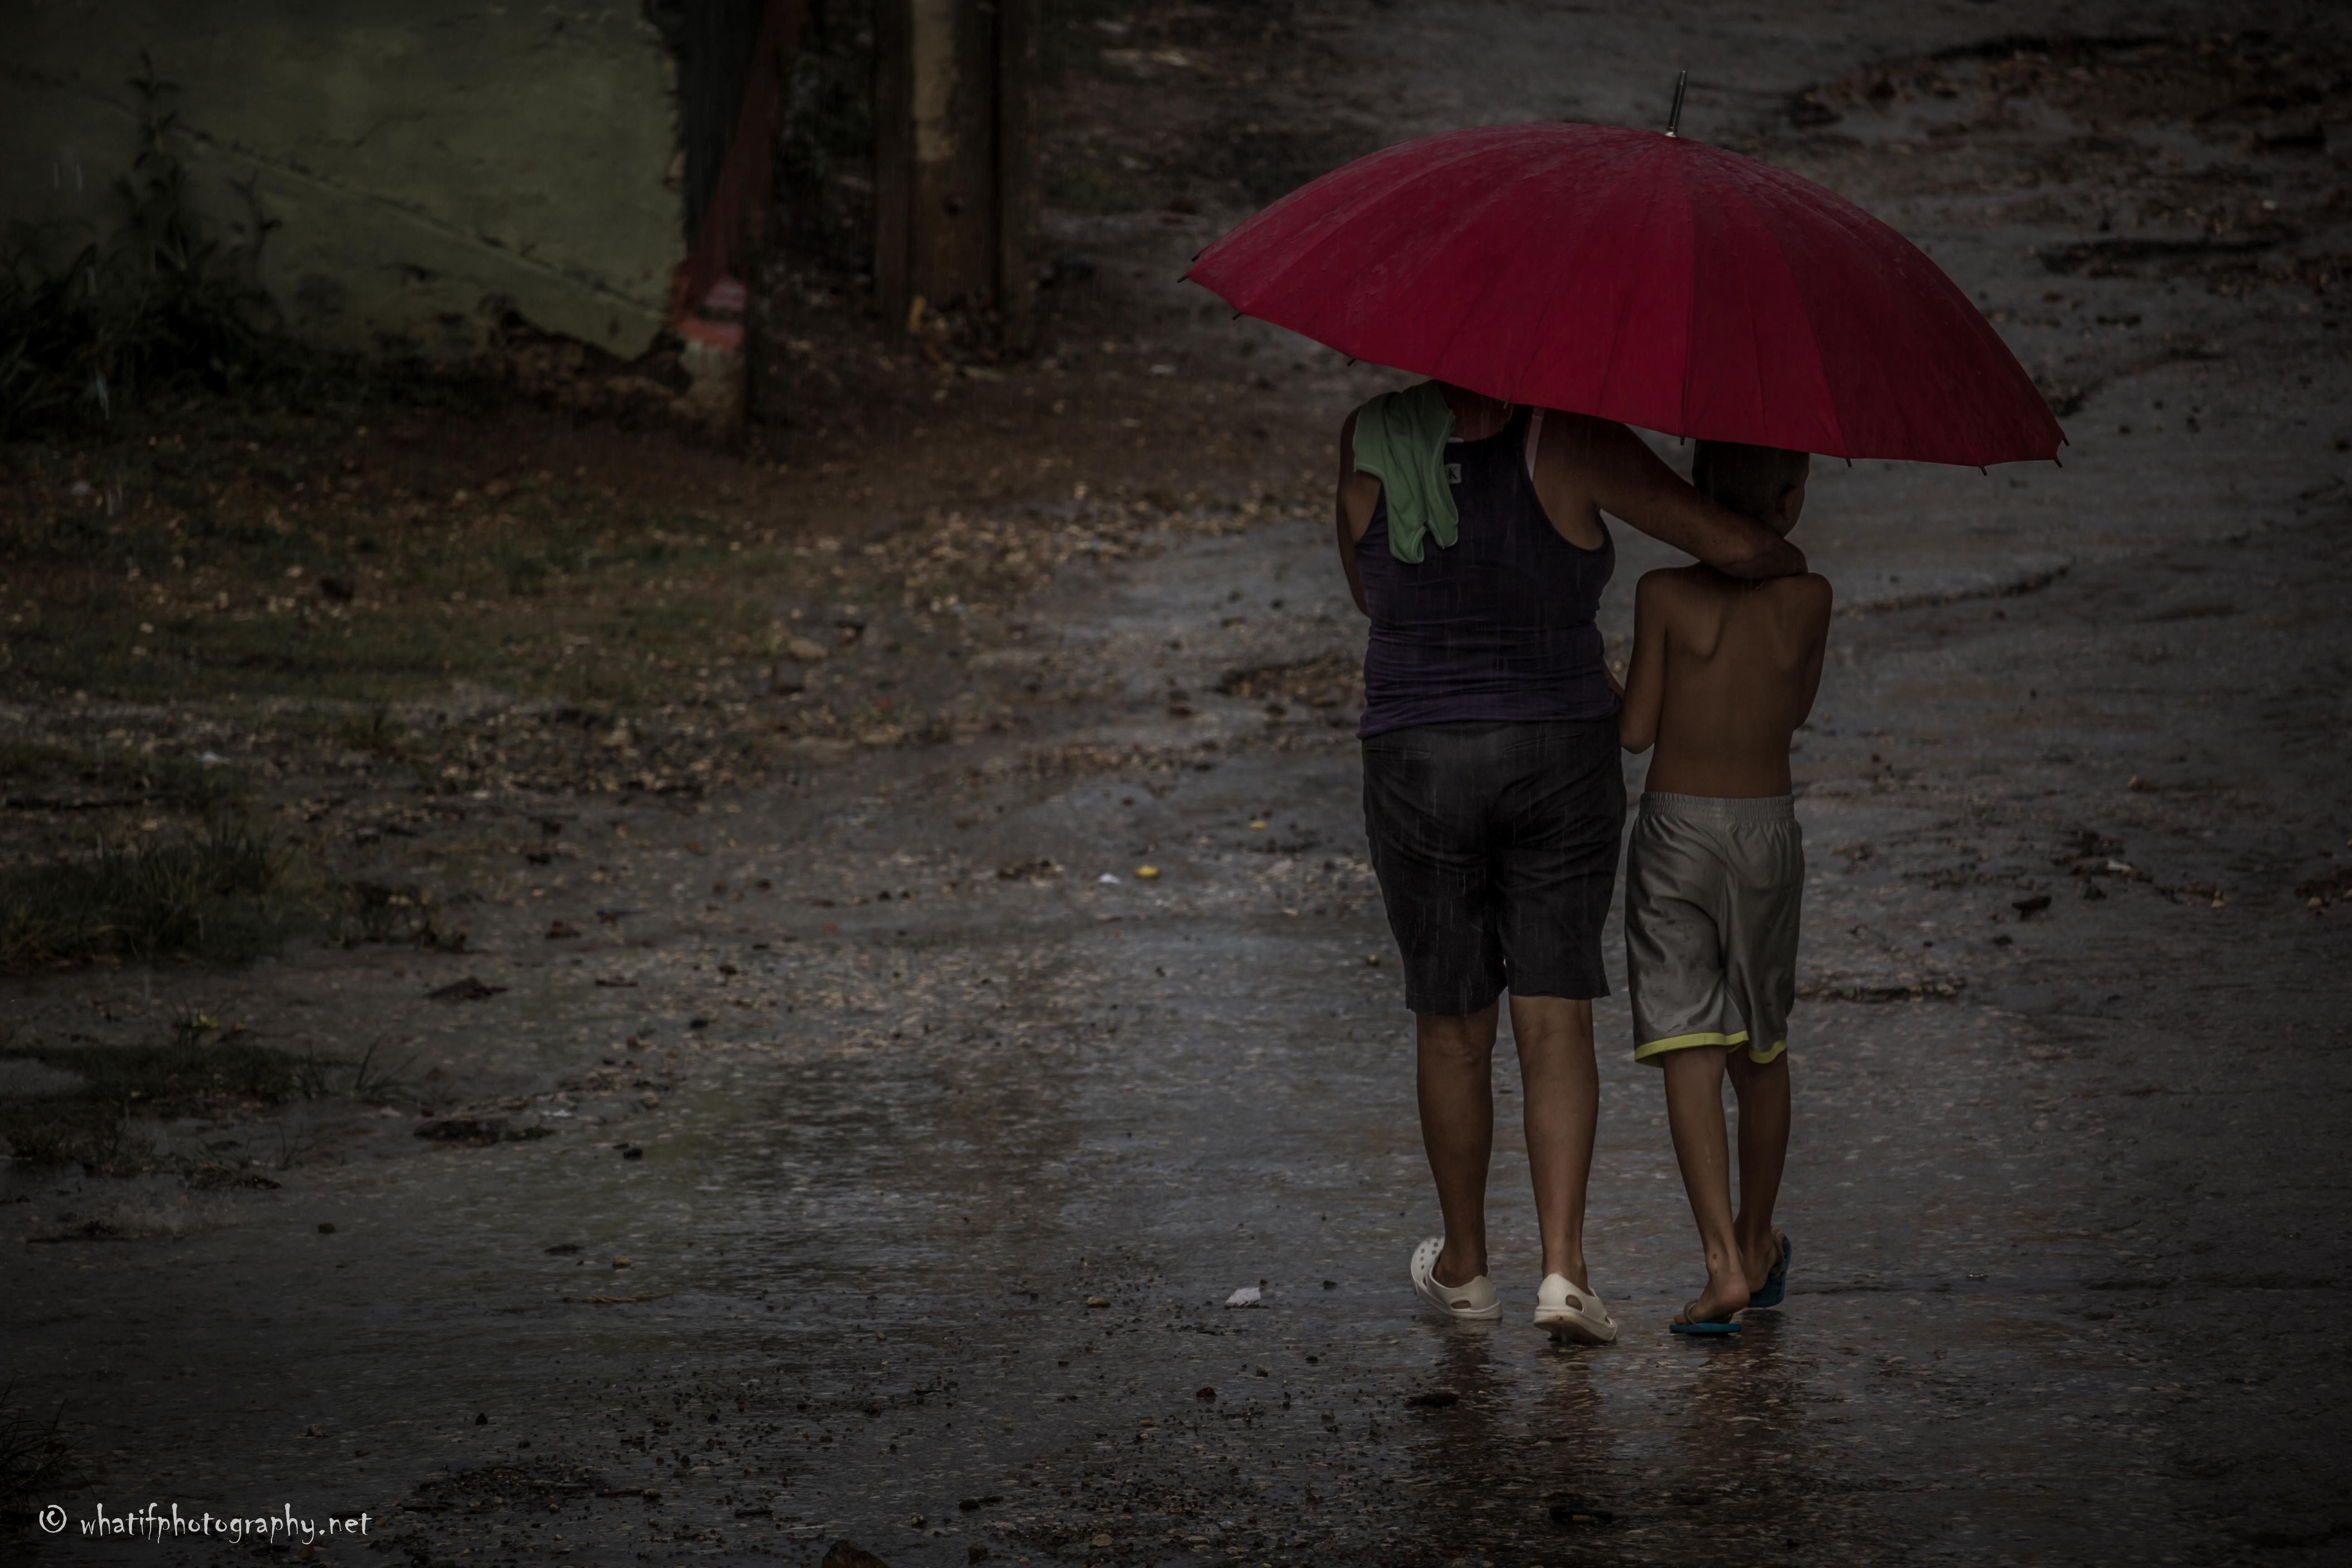 Rain doesn't stop us